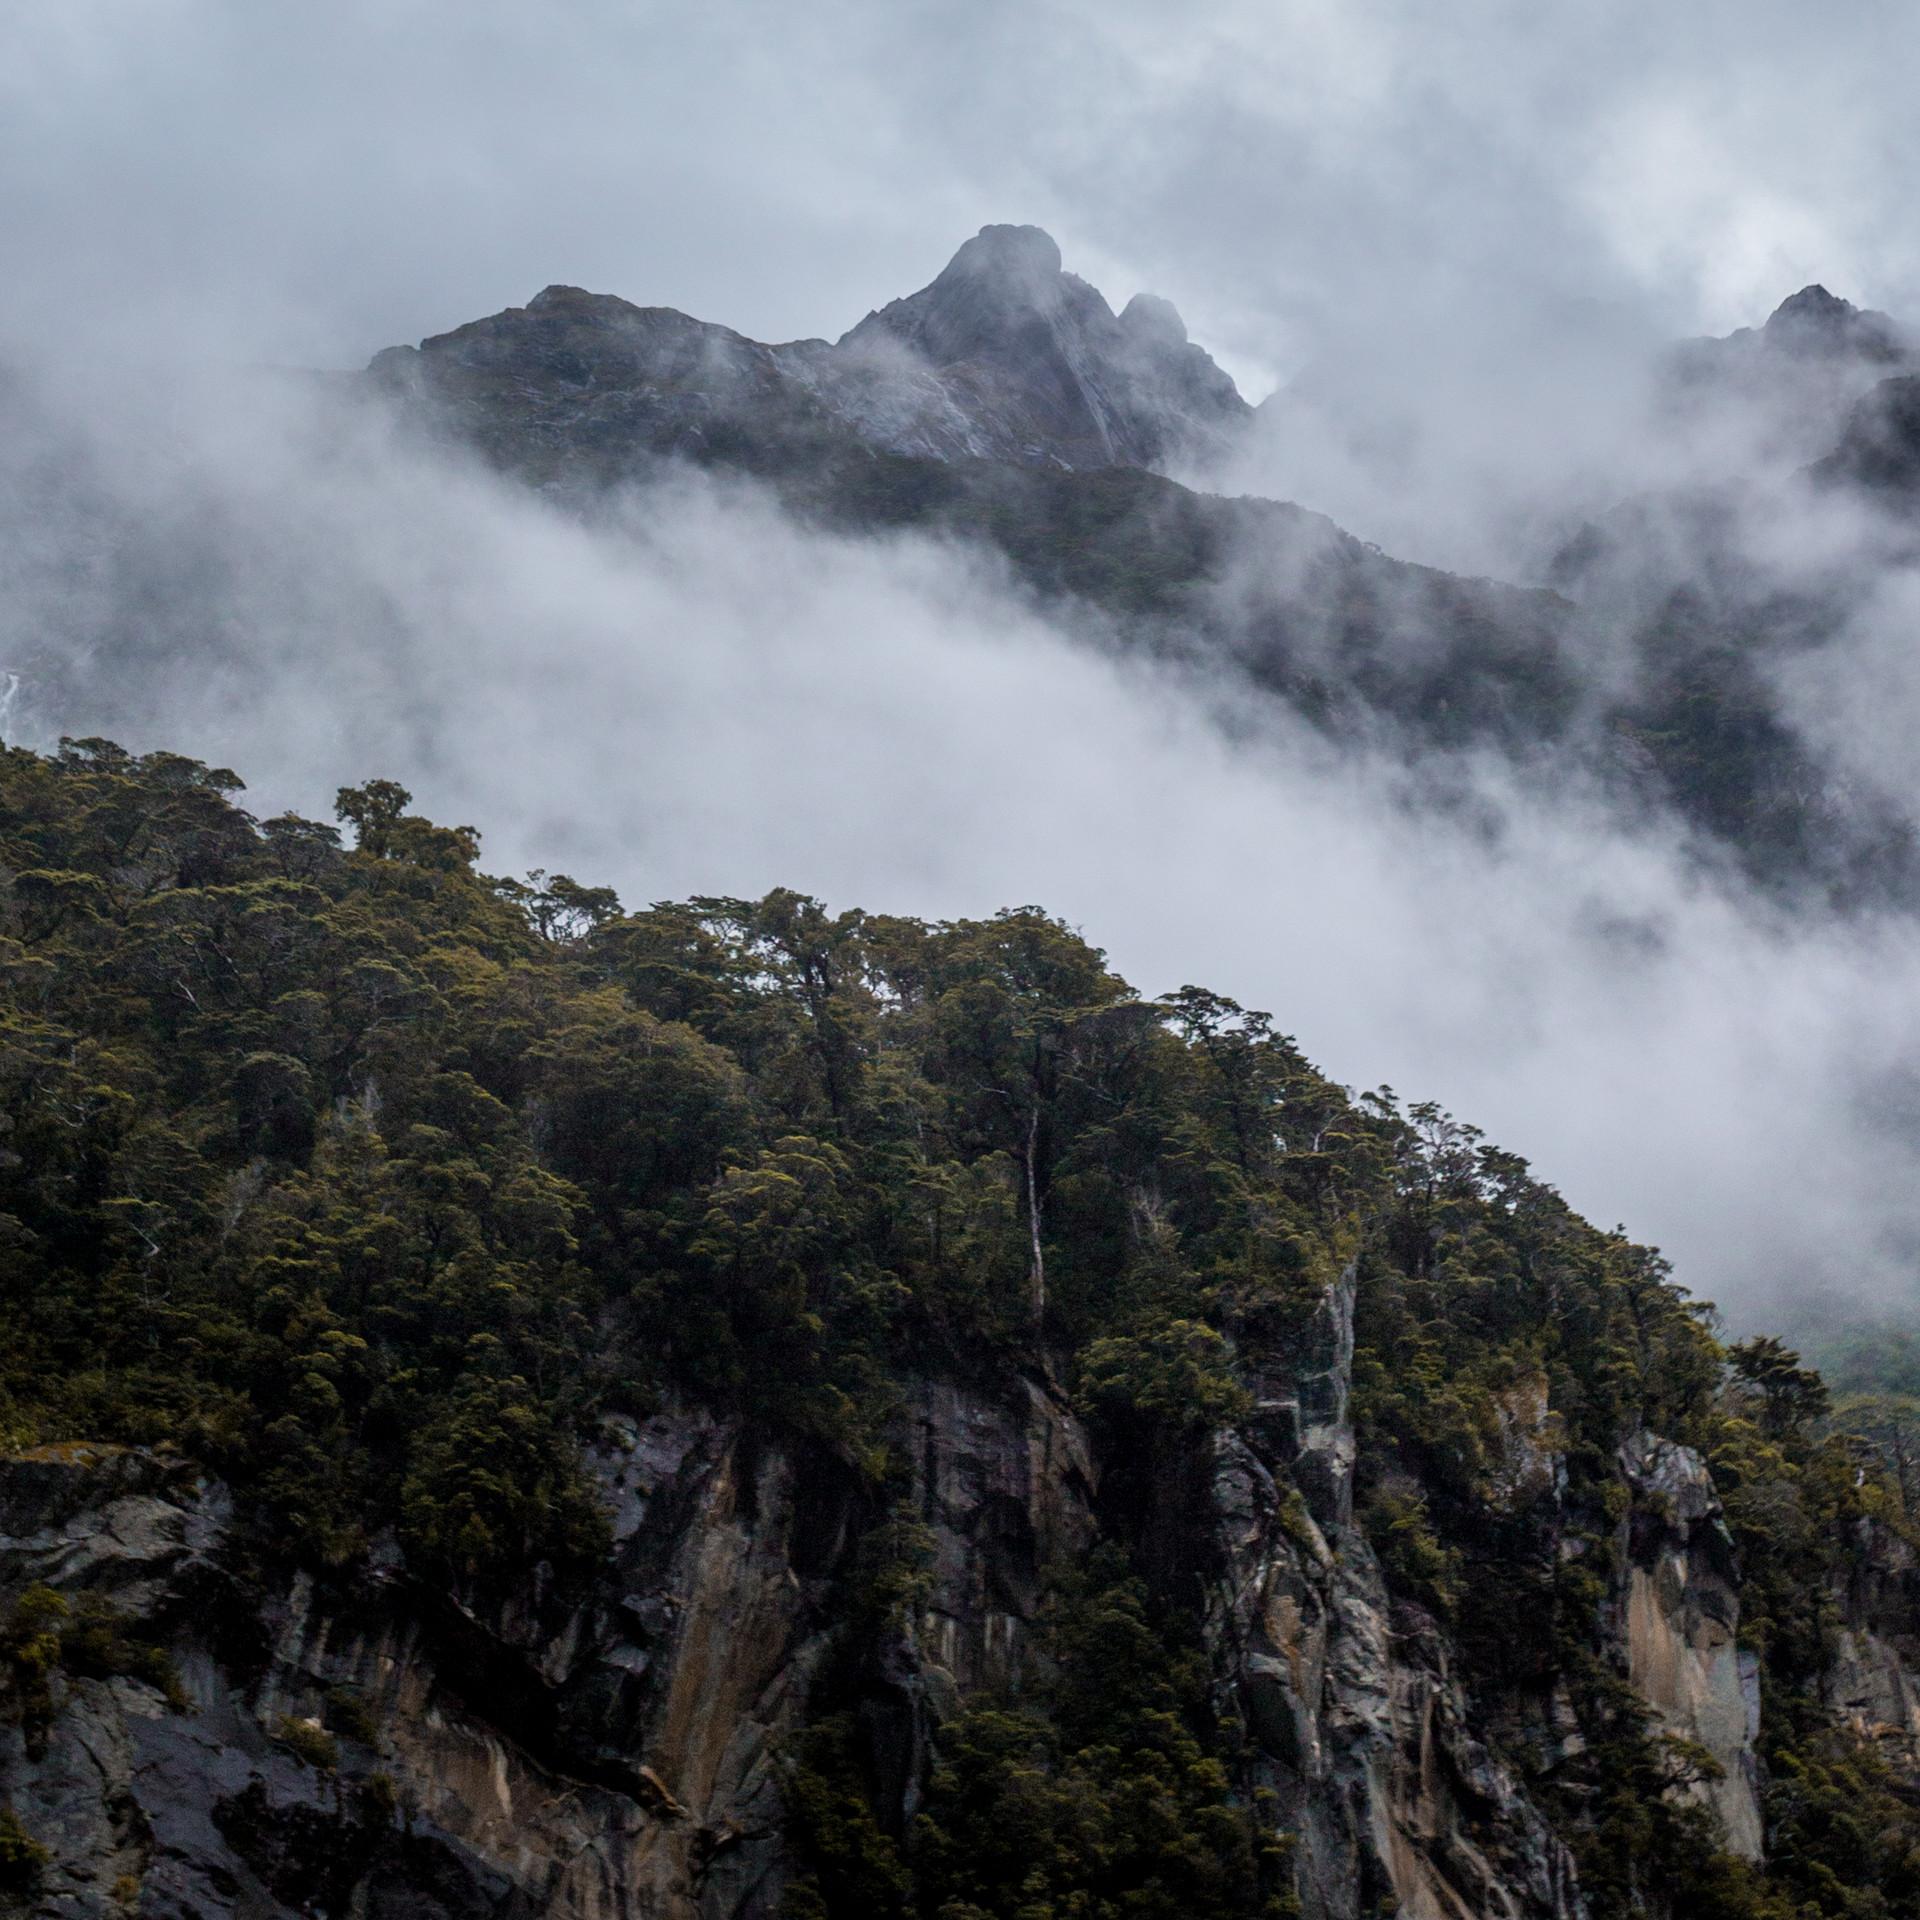 Rolling fog in New Zealand's Milford Sound wanderlust